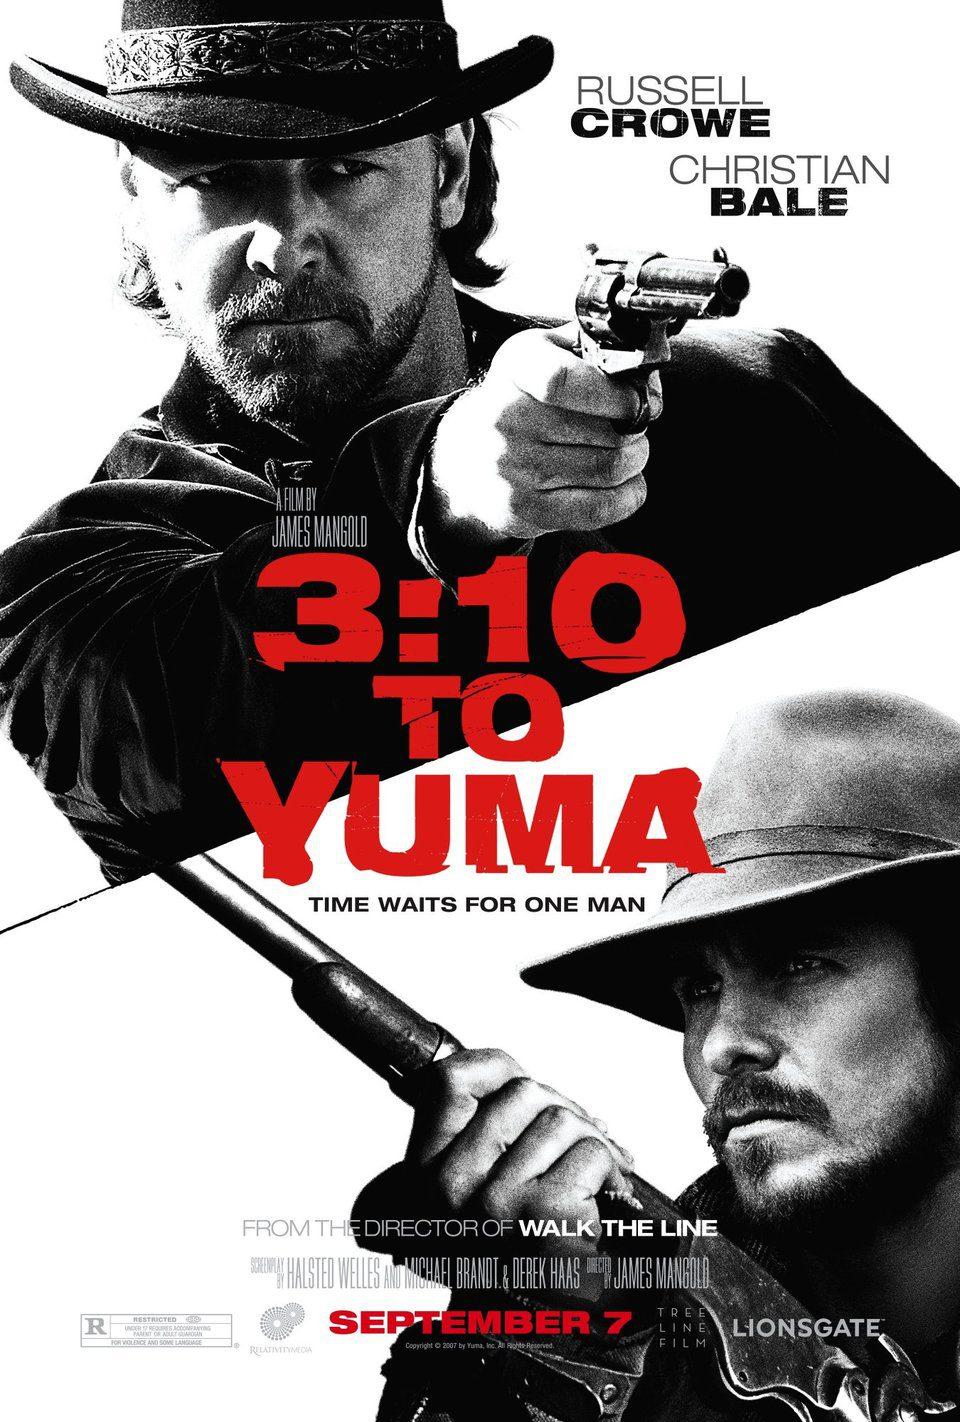 EEUU poster for 3:10 to Yuma